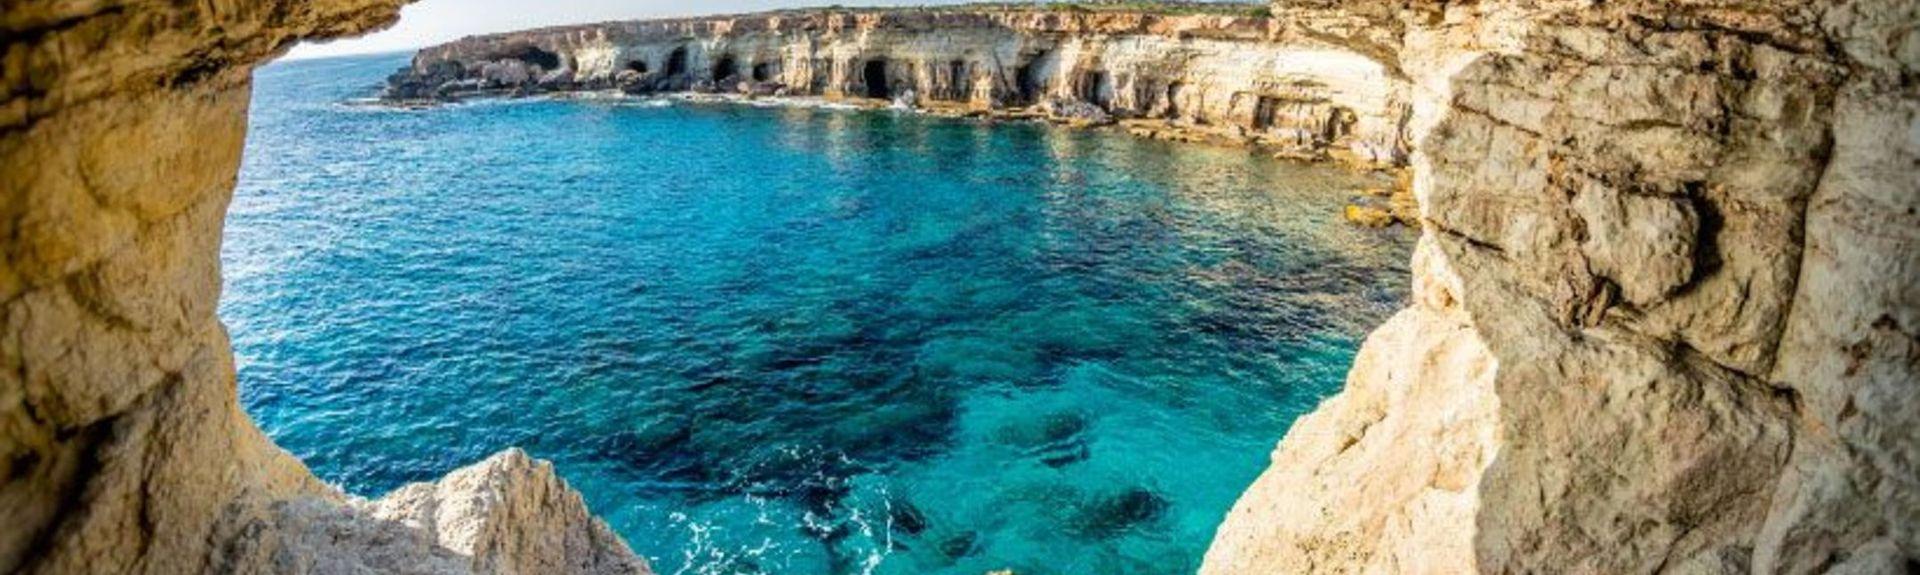 Ayia Thekla, Sotira, Cipro